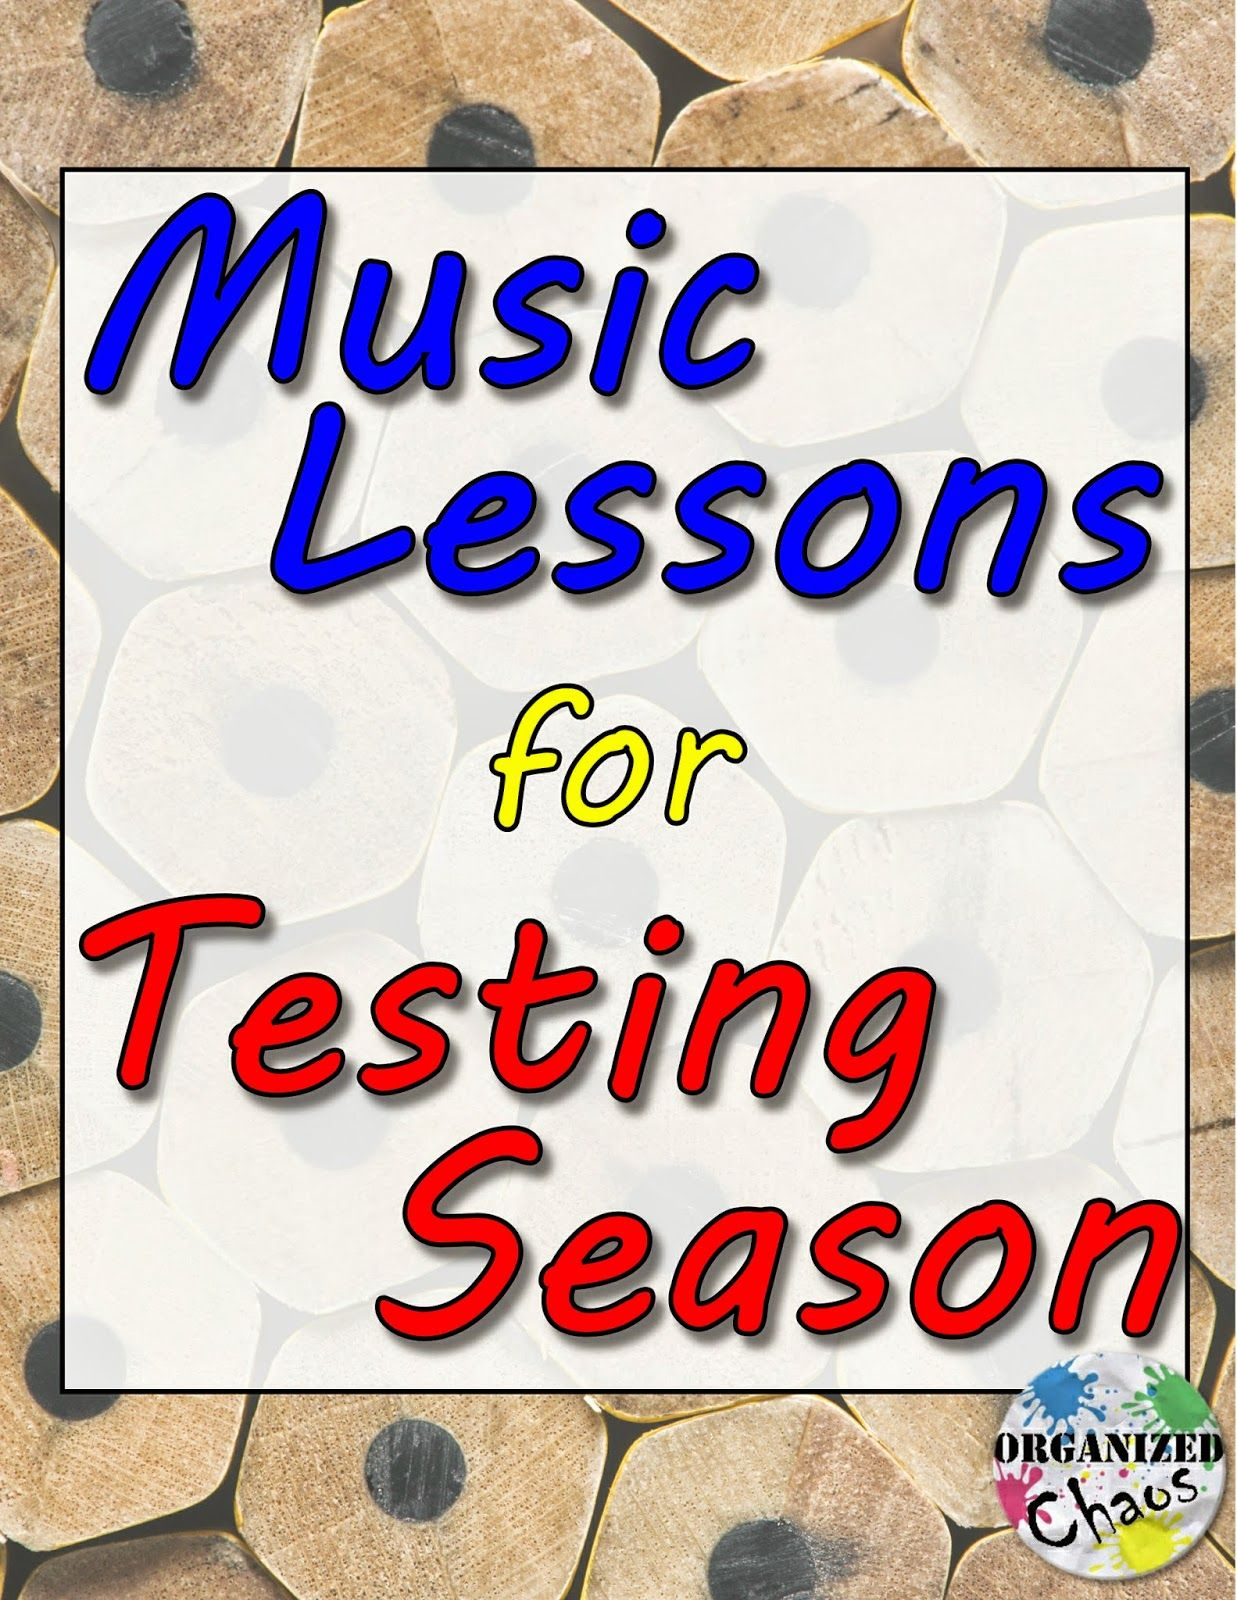 Teacher Tuesday Music Lessons For Testing Season